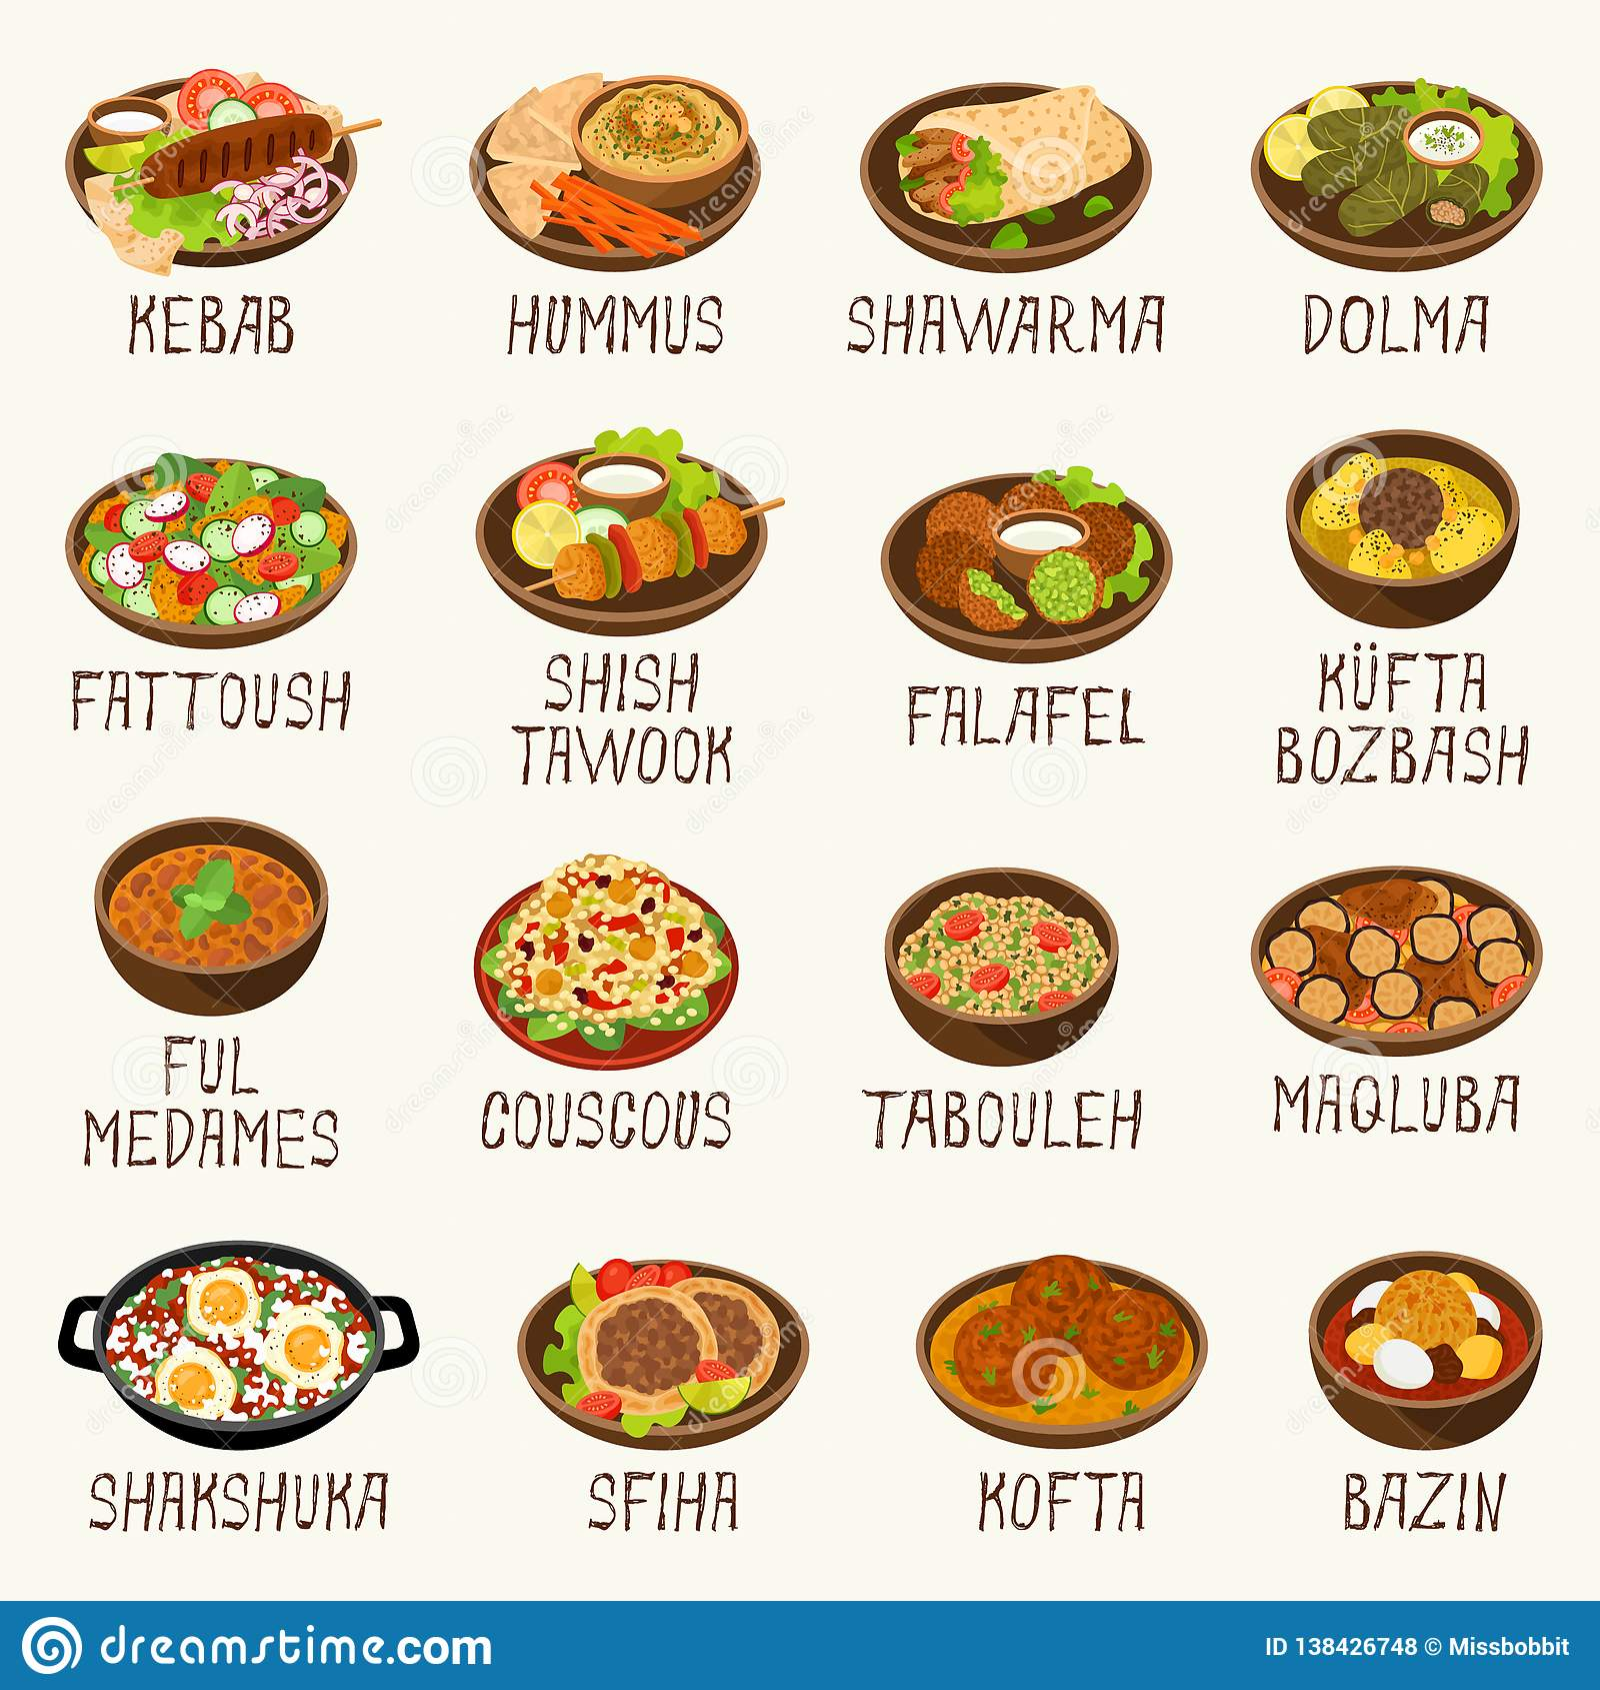 Egyptian Food Set Stock Illustrations 170 Egyptian Food Set Stock Illustrations Vectors Clipart Dreamstime